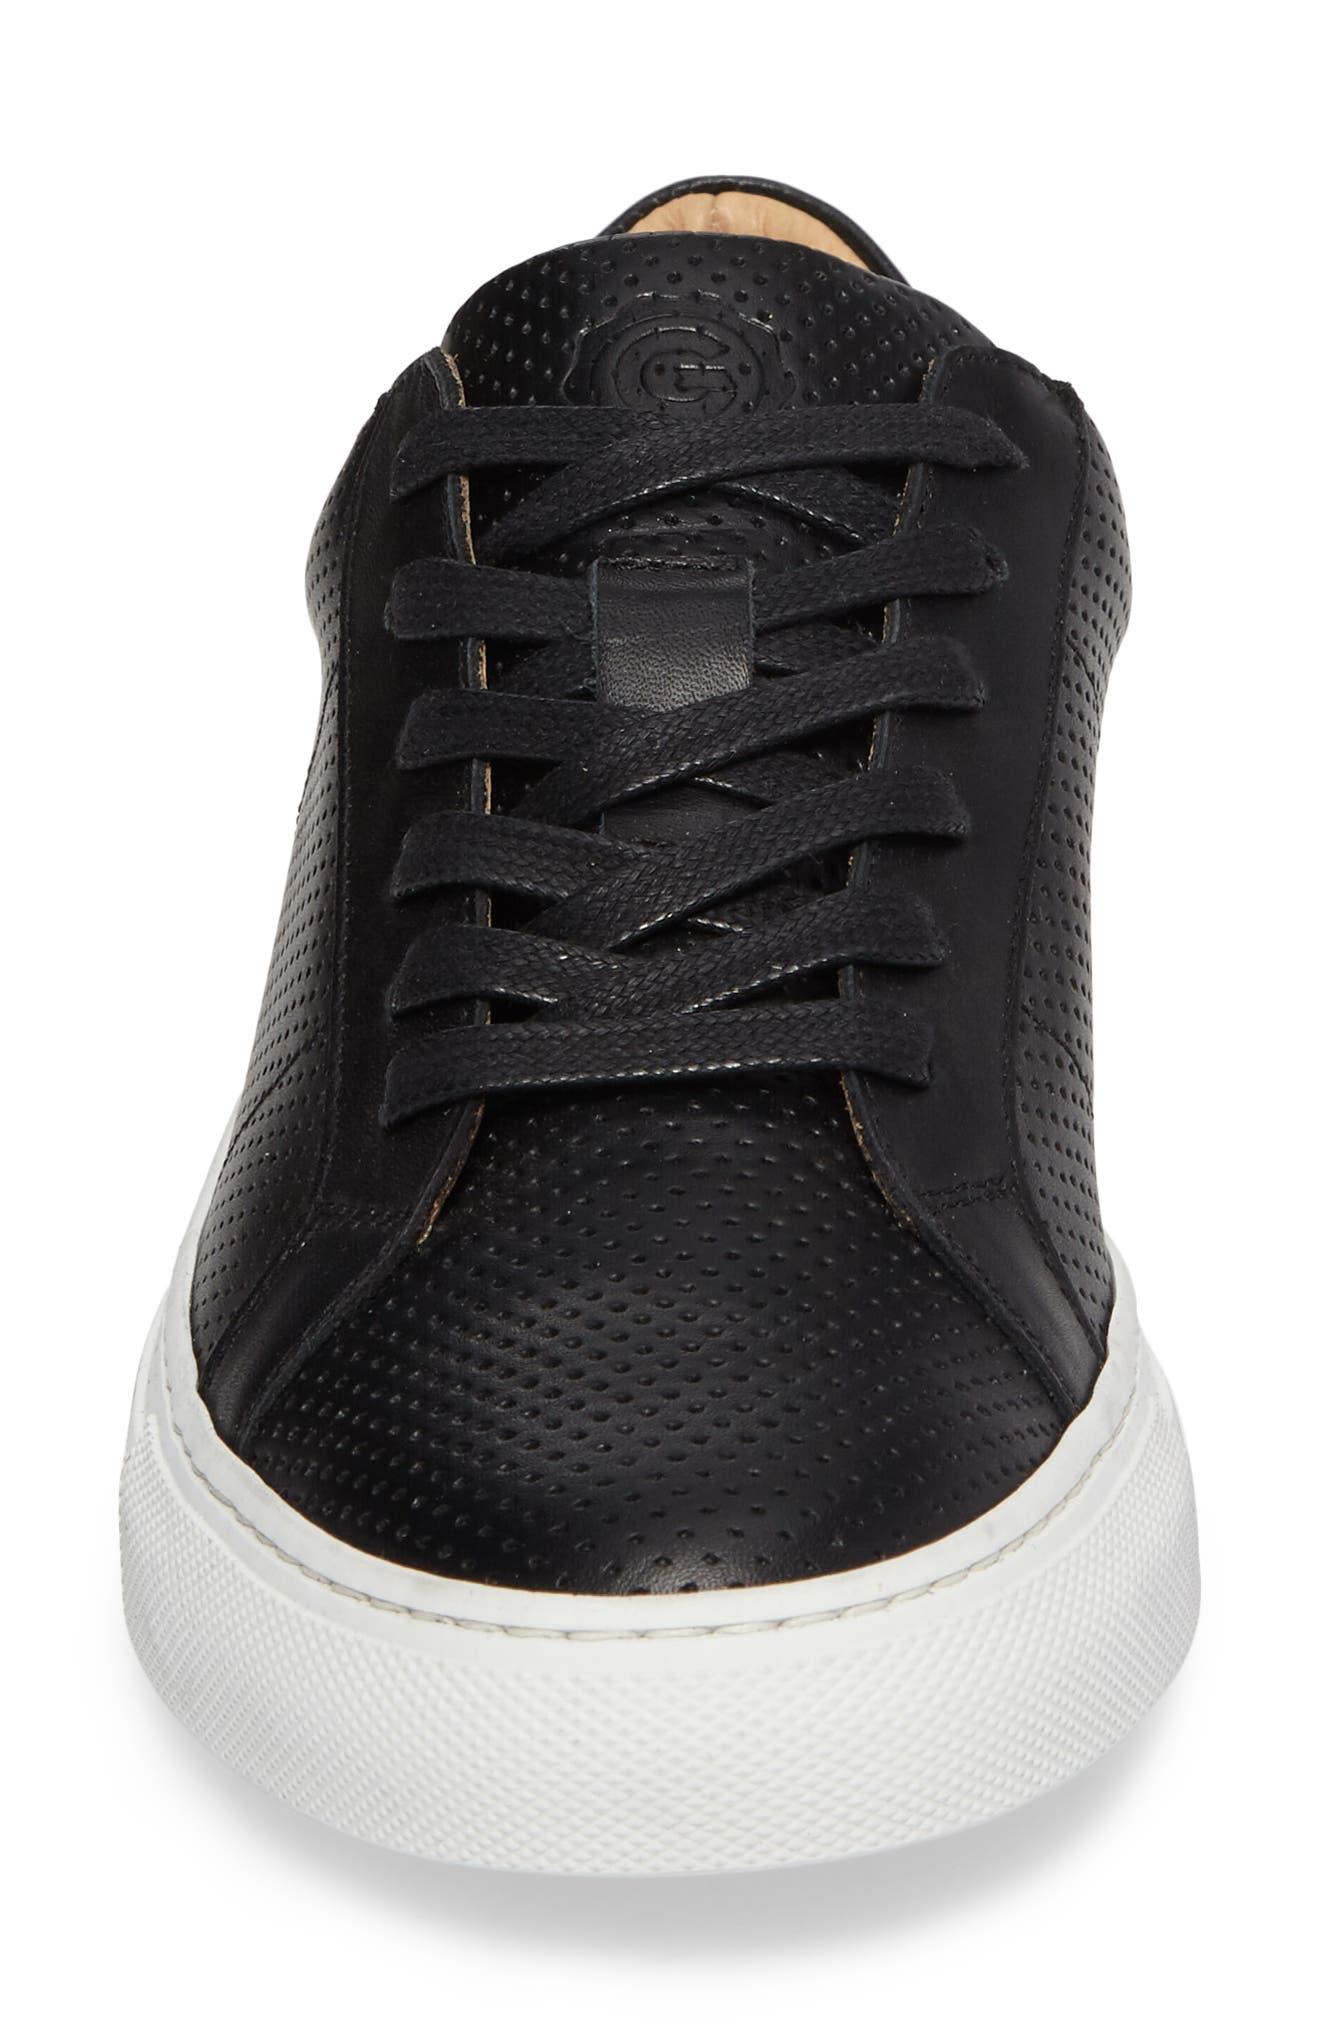 Royale Low Top Sneaker,                             Alternate thumbnail 4, color,                             BLACK PERFORATED